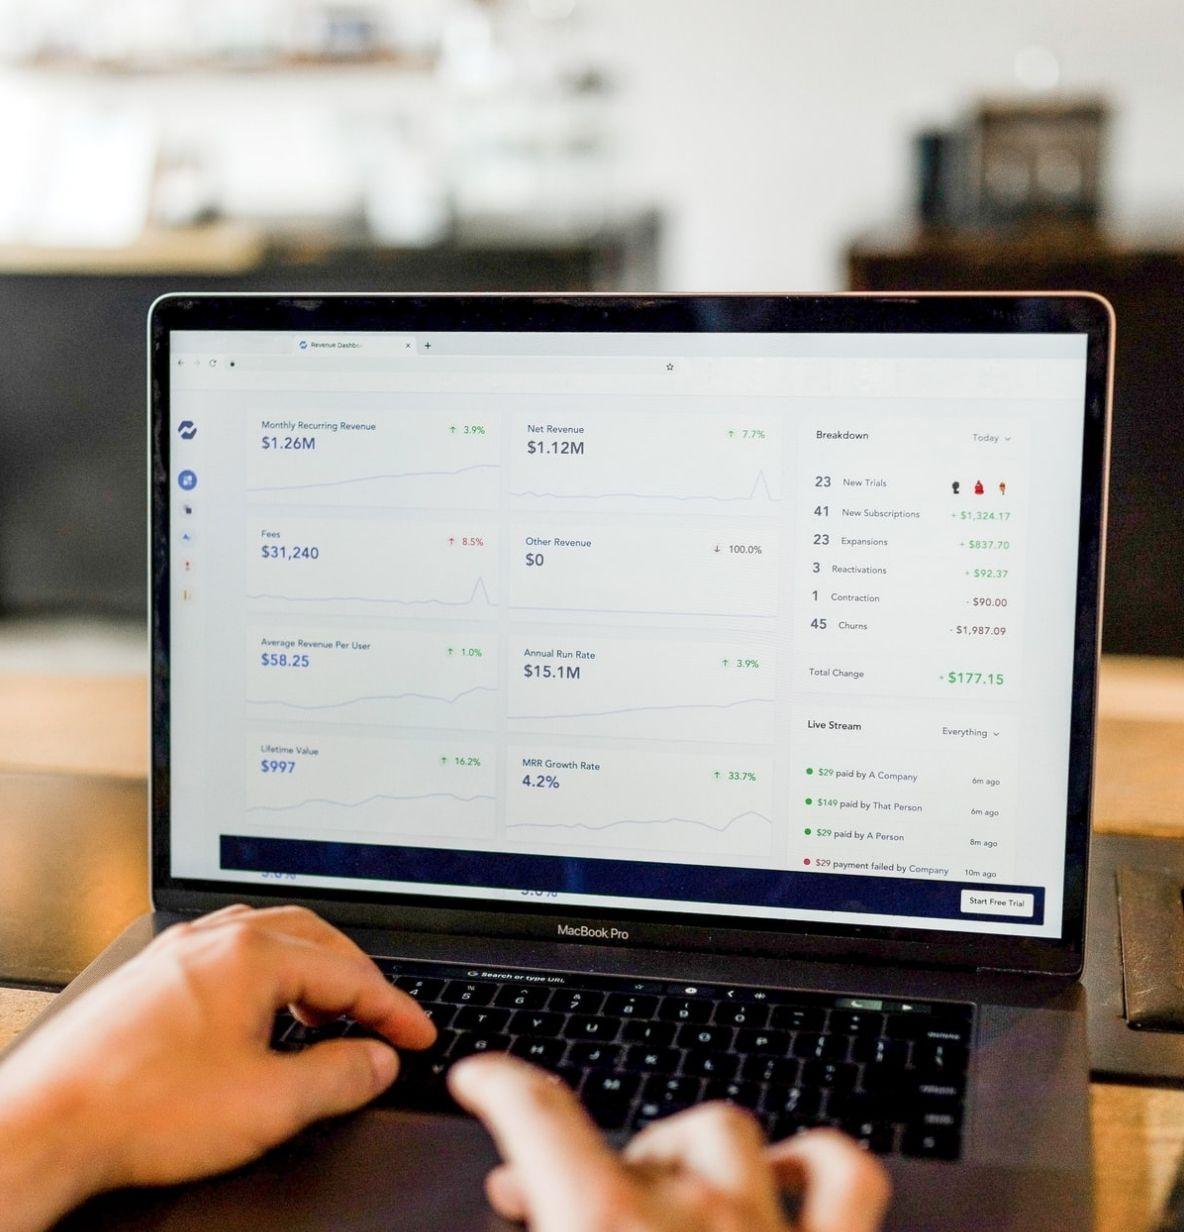 Employee app engagement metrics on a laptop